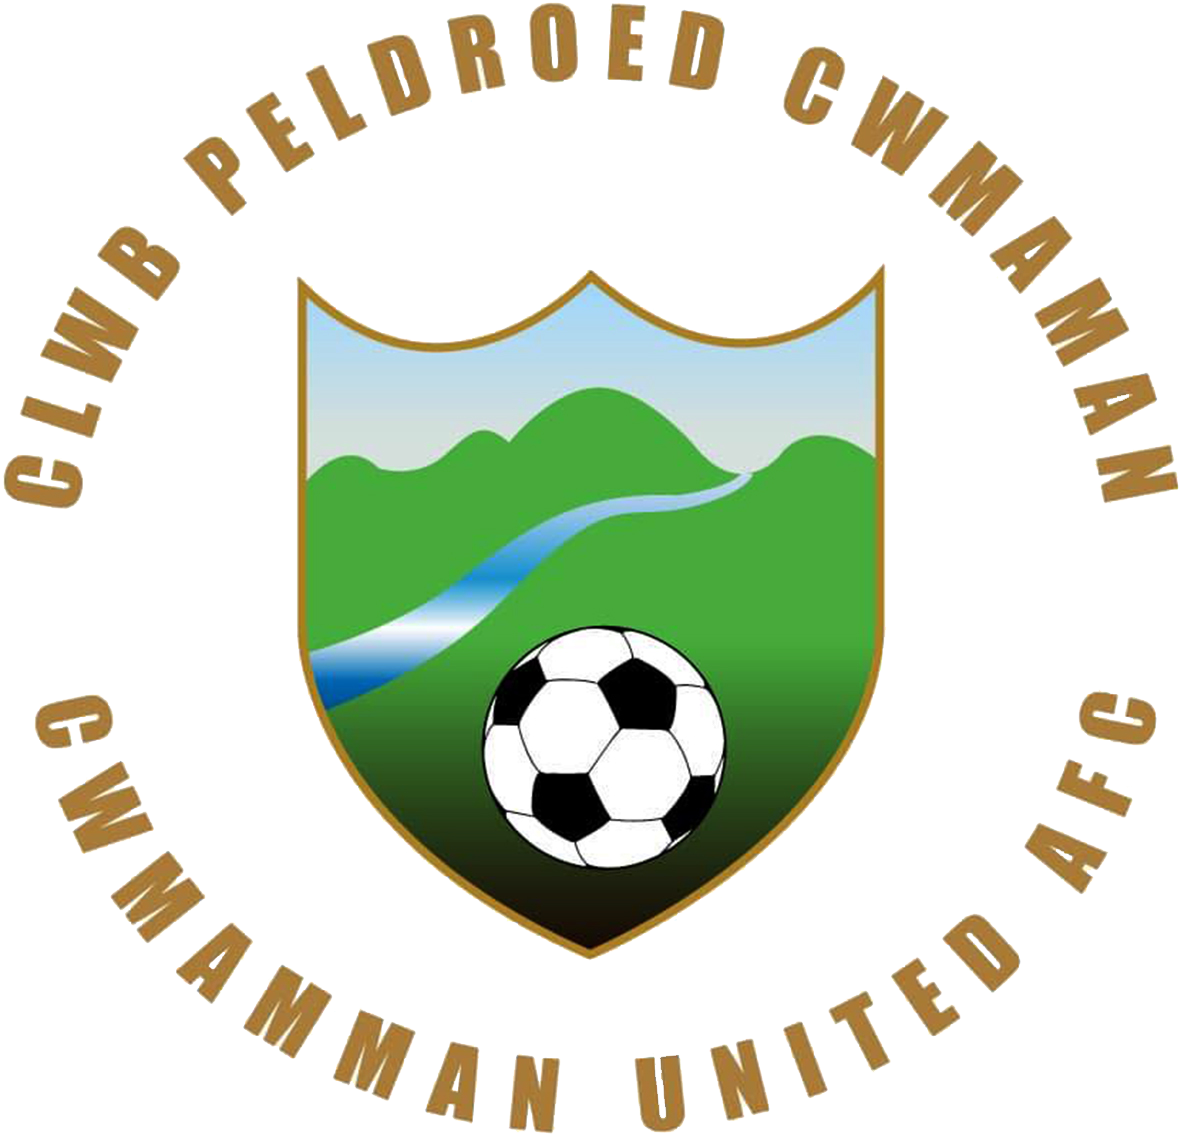 The Official Cwmamman United Football Club